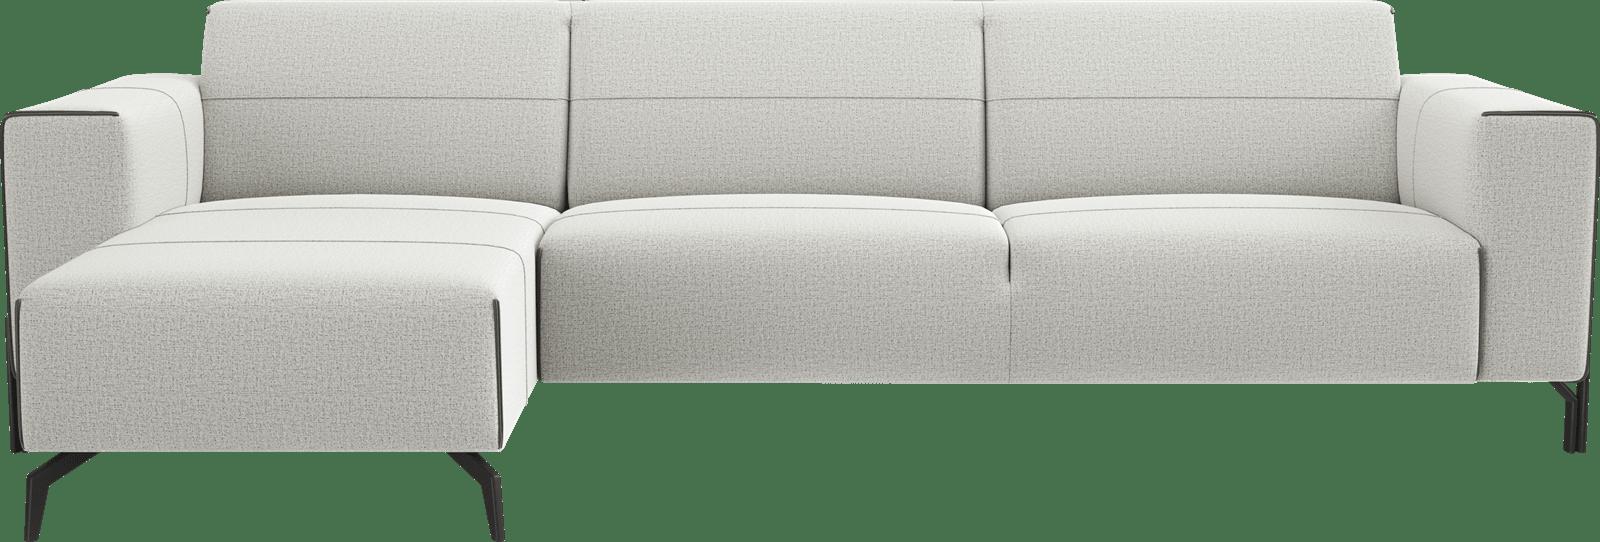 XOOON - Prizzi - Salons - Longchair links - 2,5 zits arm rechts